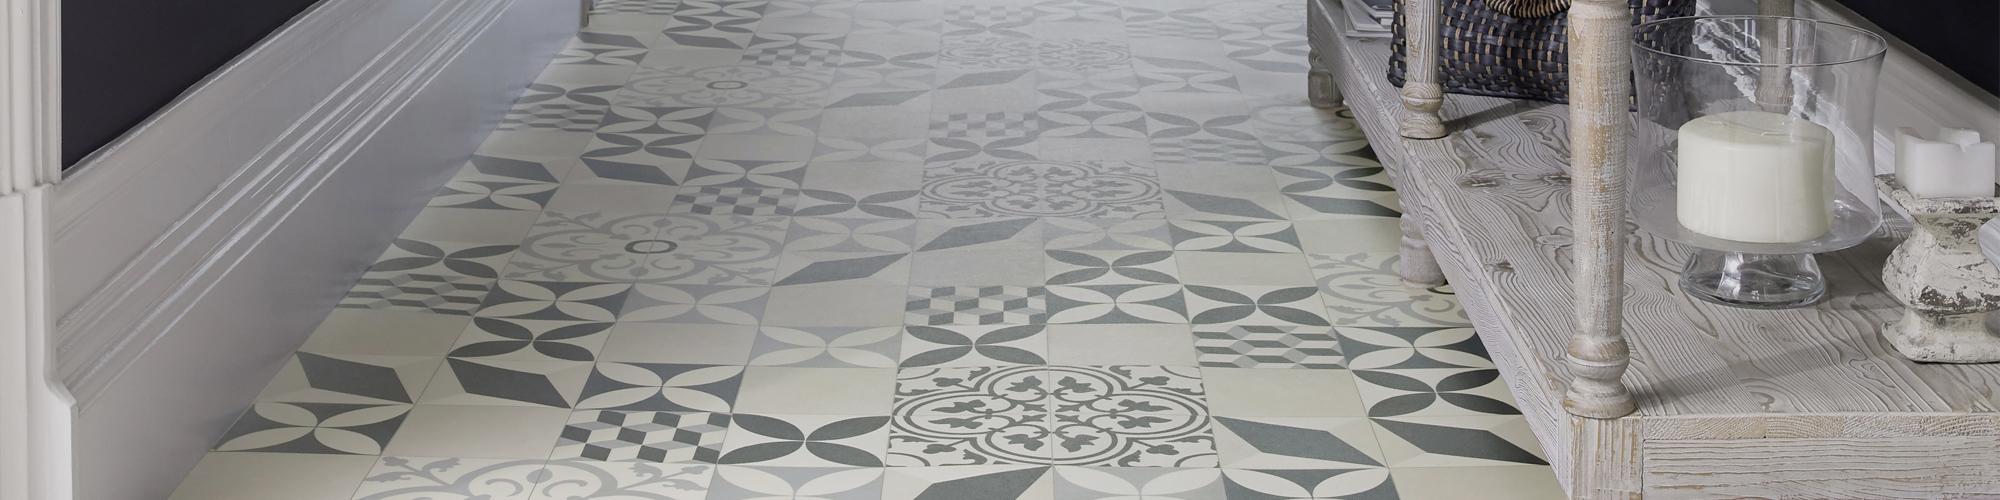 Les sols aspect carreaux de ciment